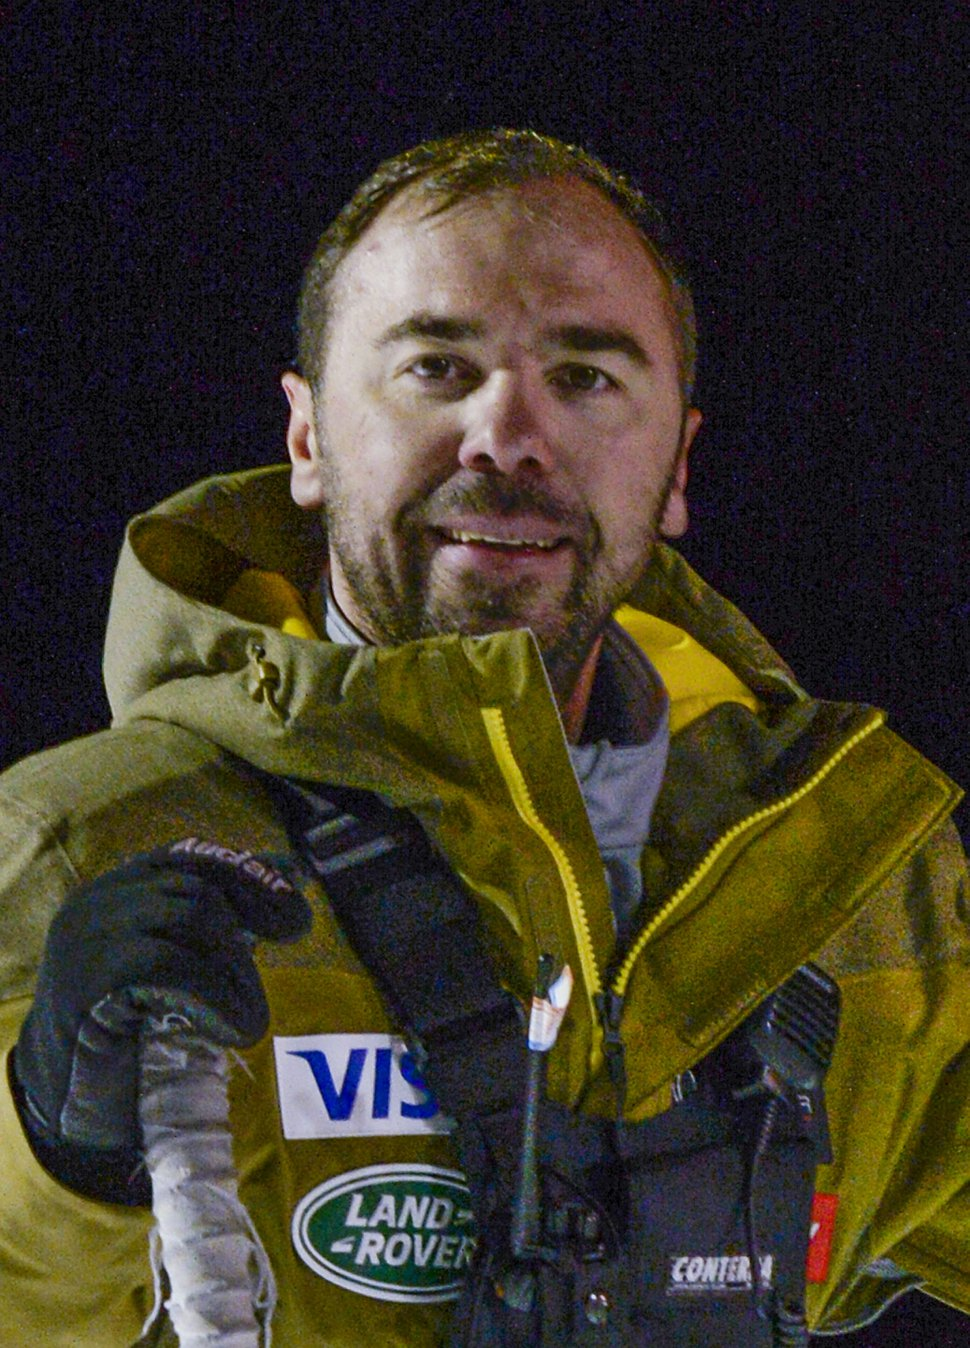 (Leah Hogsten | The Salt Lake Tribune) U.S. Aerials Ski team coach, Vlad Lebedev, Jan. 7, 2020 at the Utah Olympic Park.